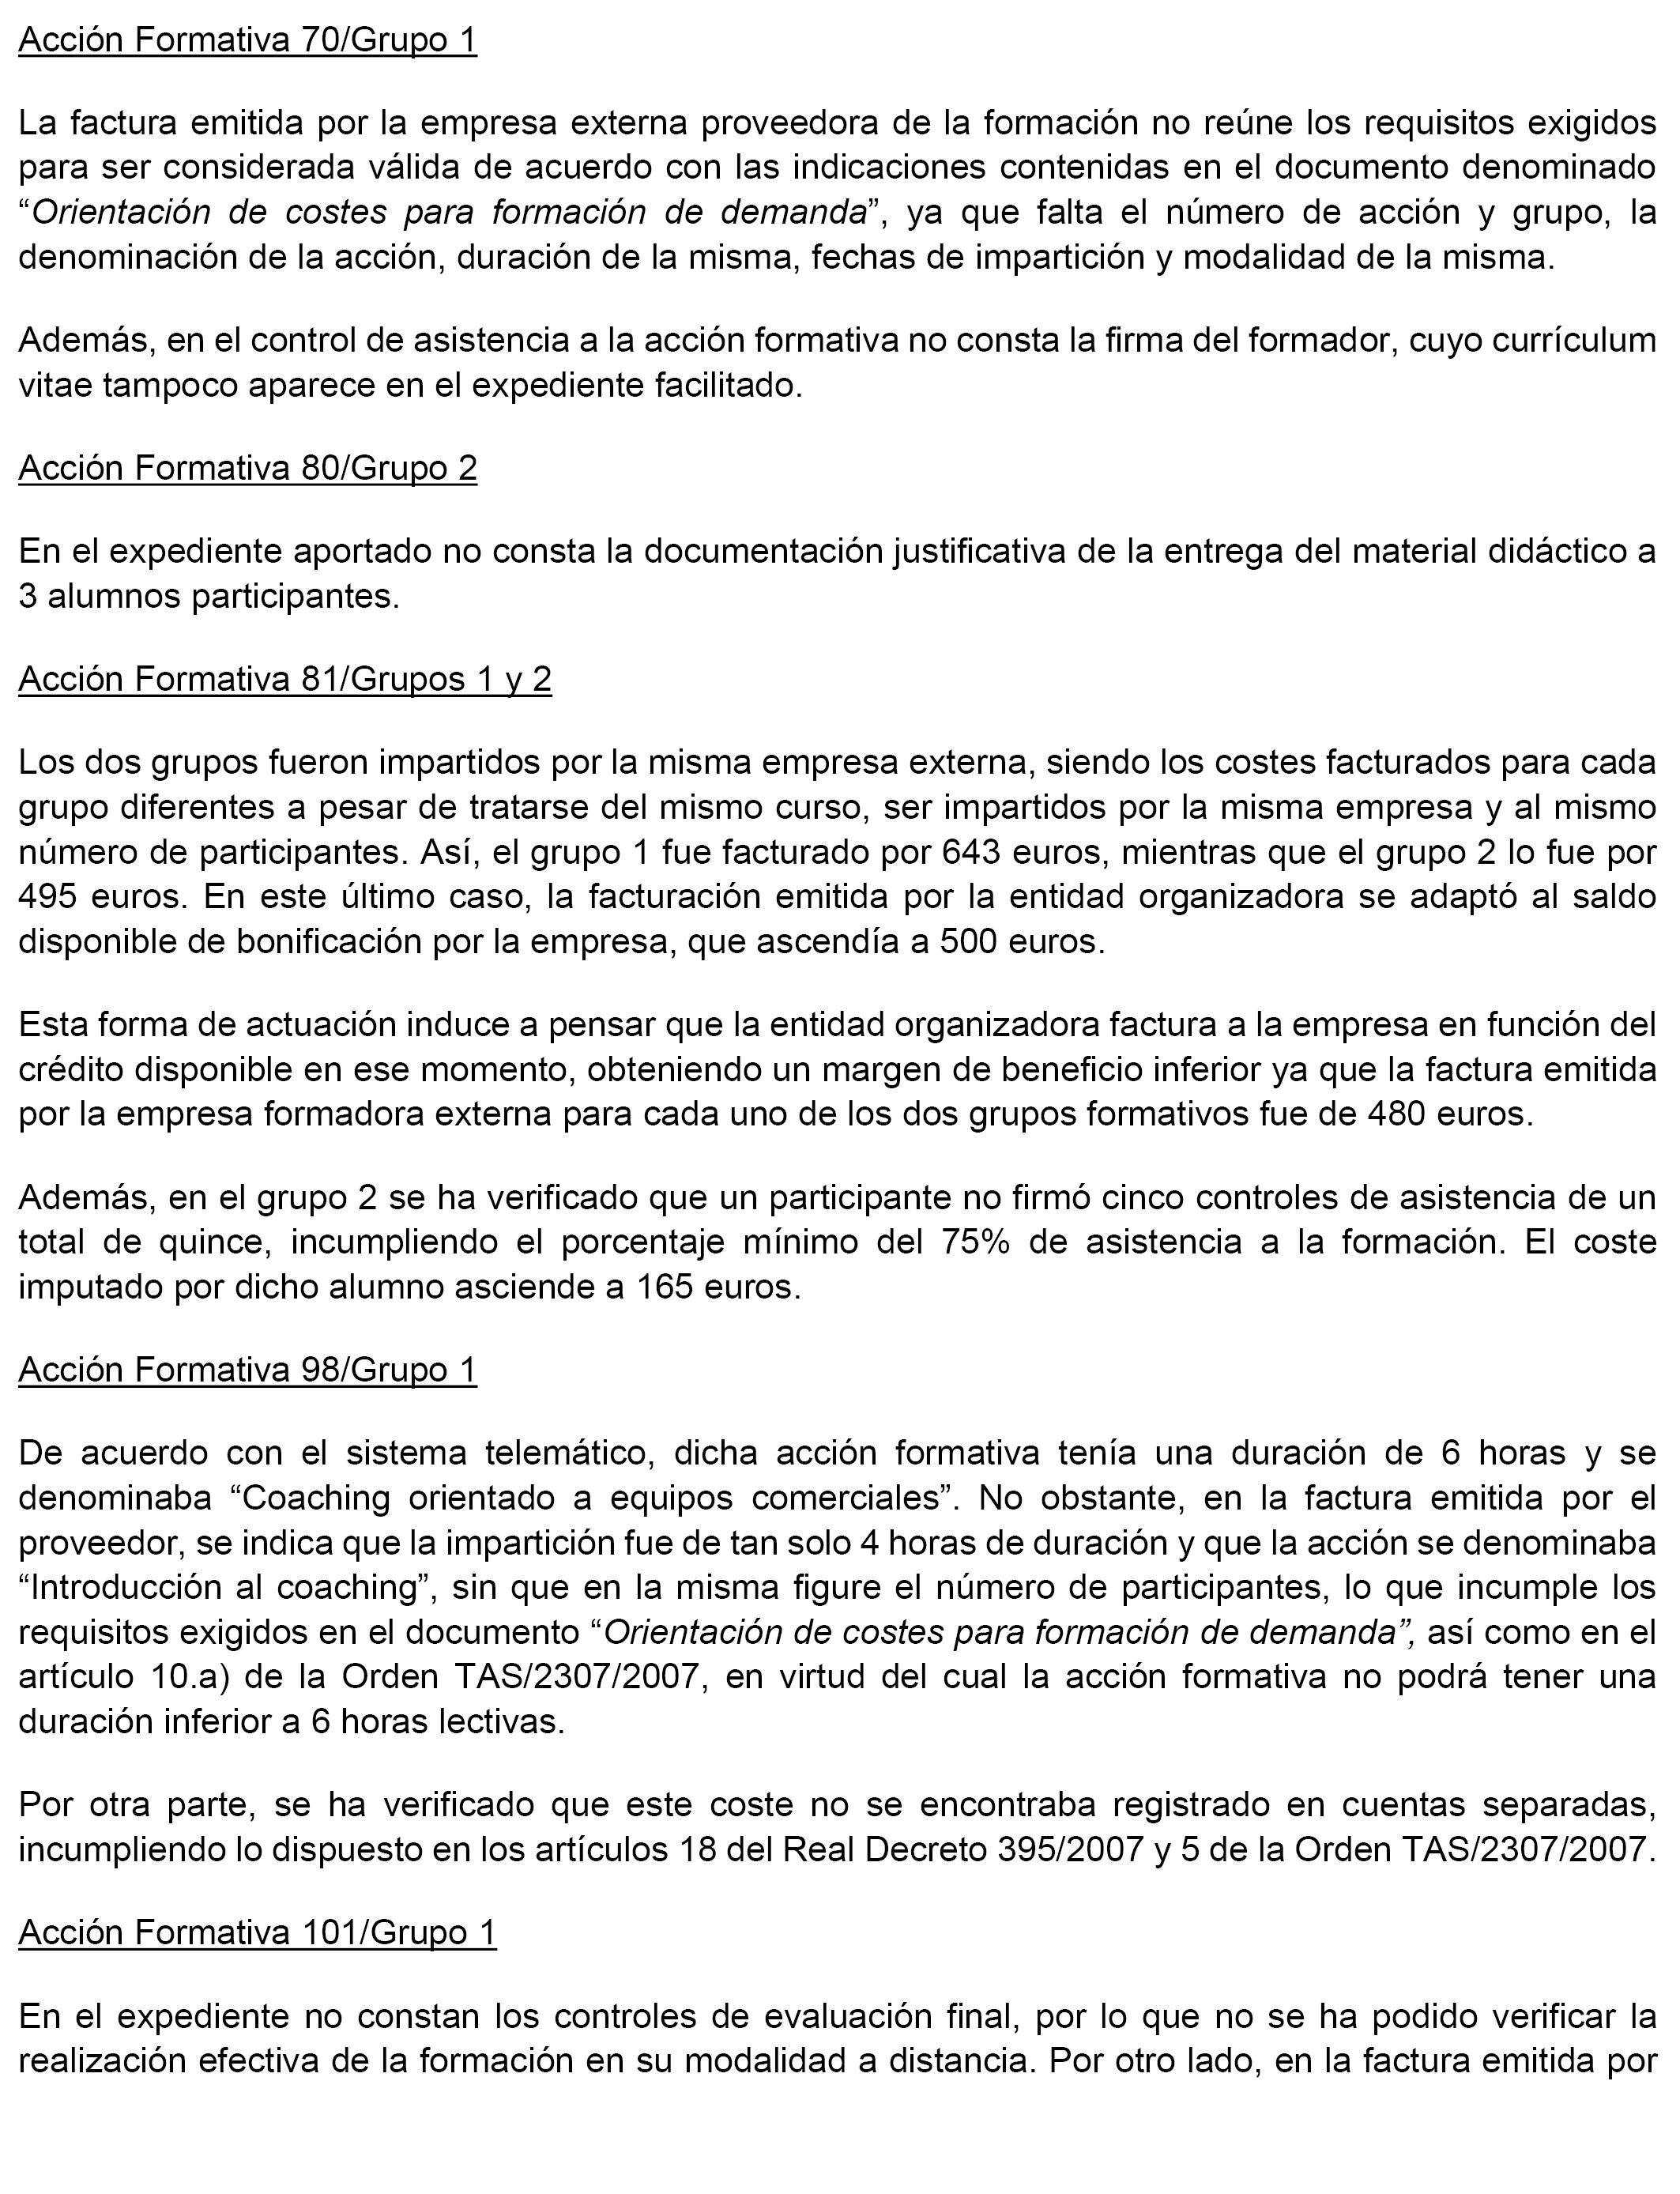 BOE.es - Documento BOE-A-2018-2789